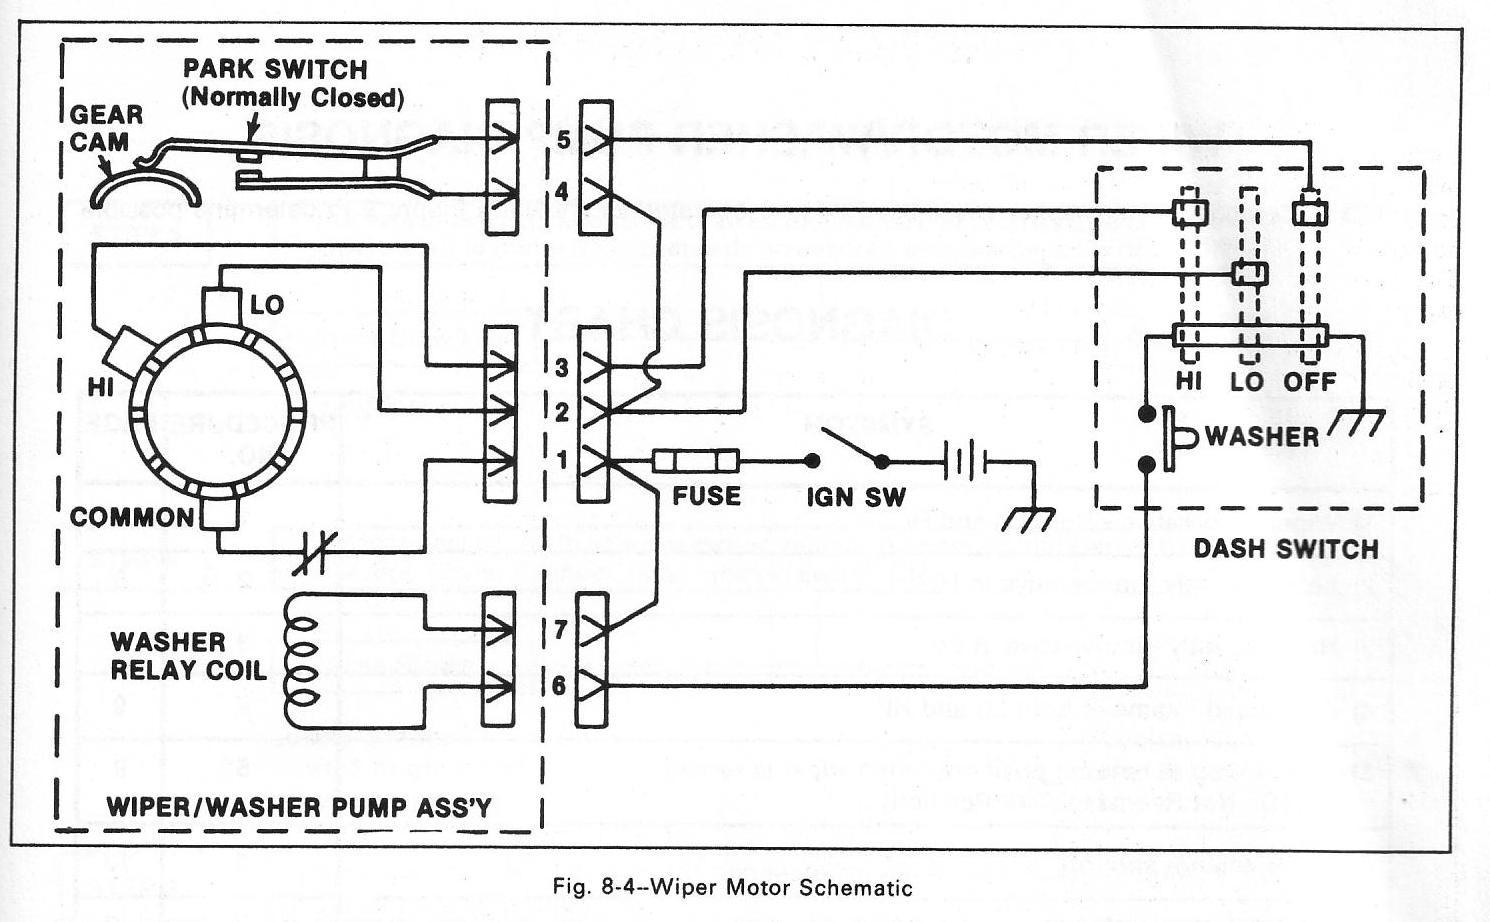 68 camaro wiring diagram three way light switch 1970 wiper motor best site harness